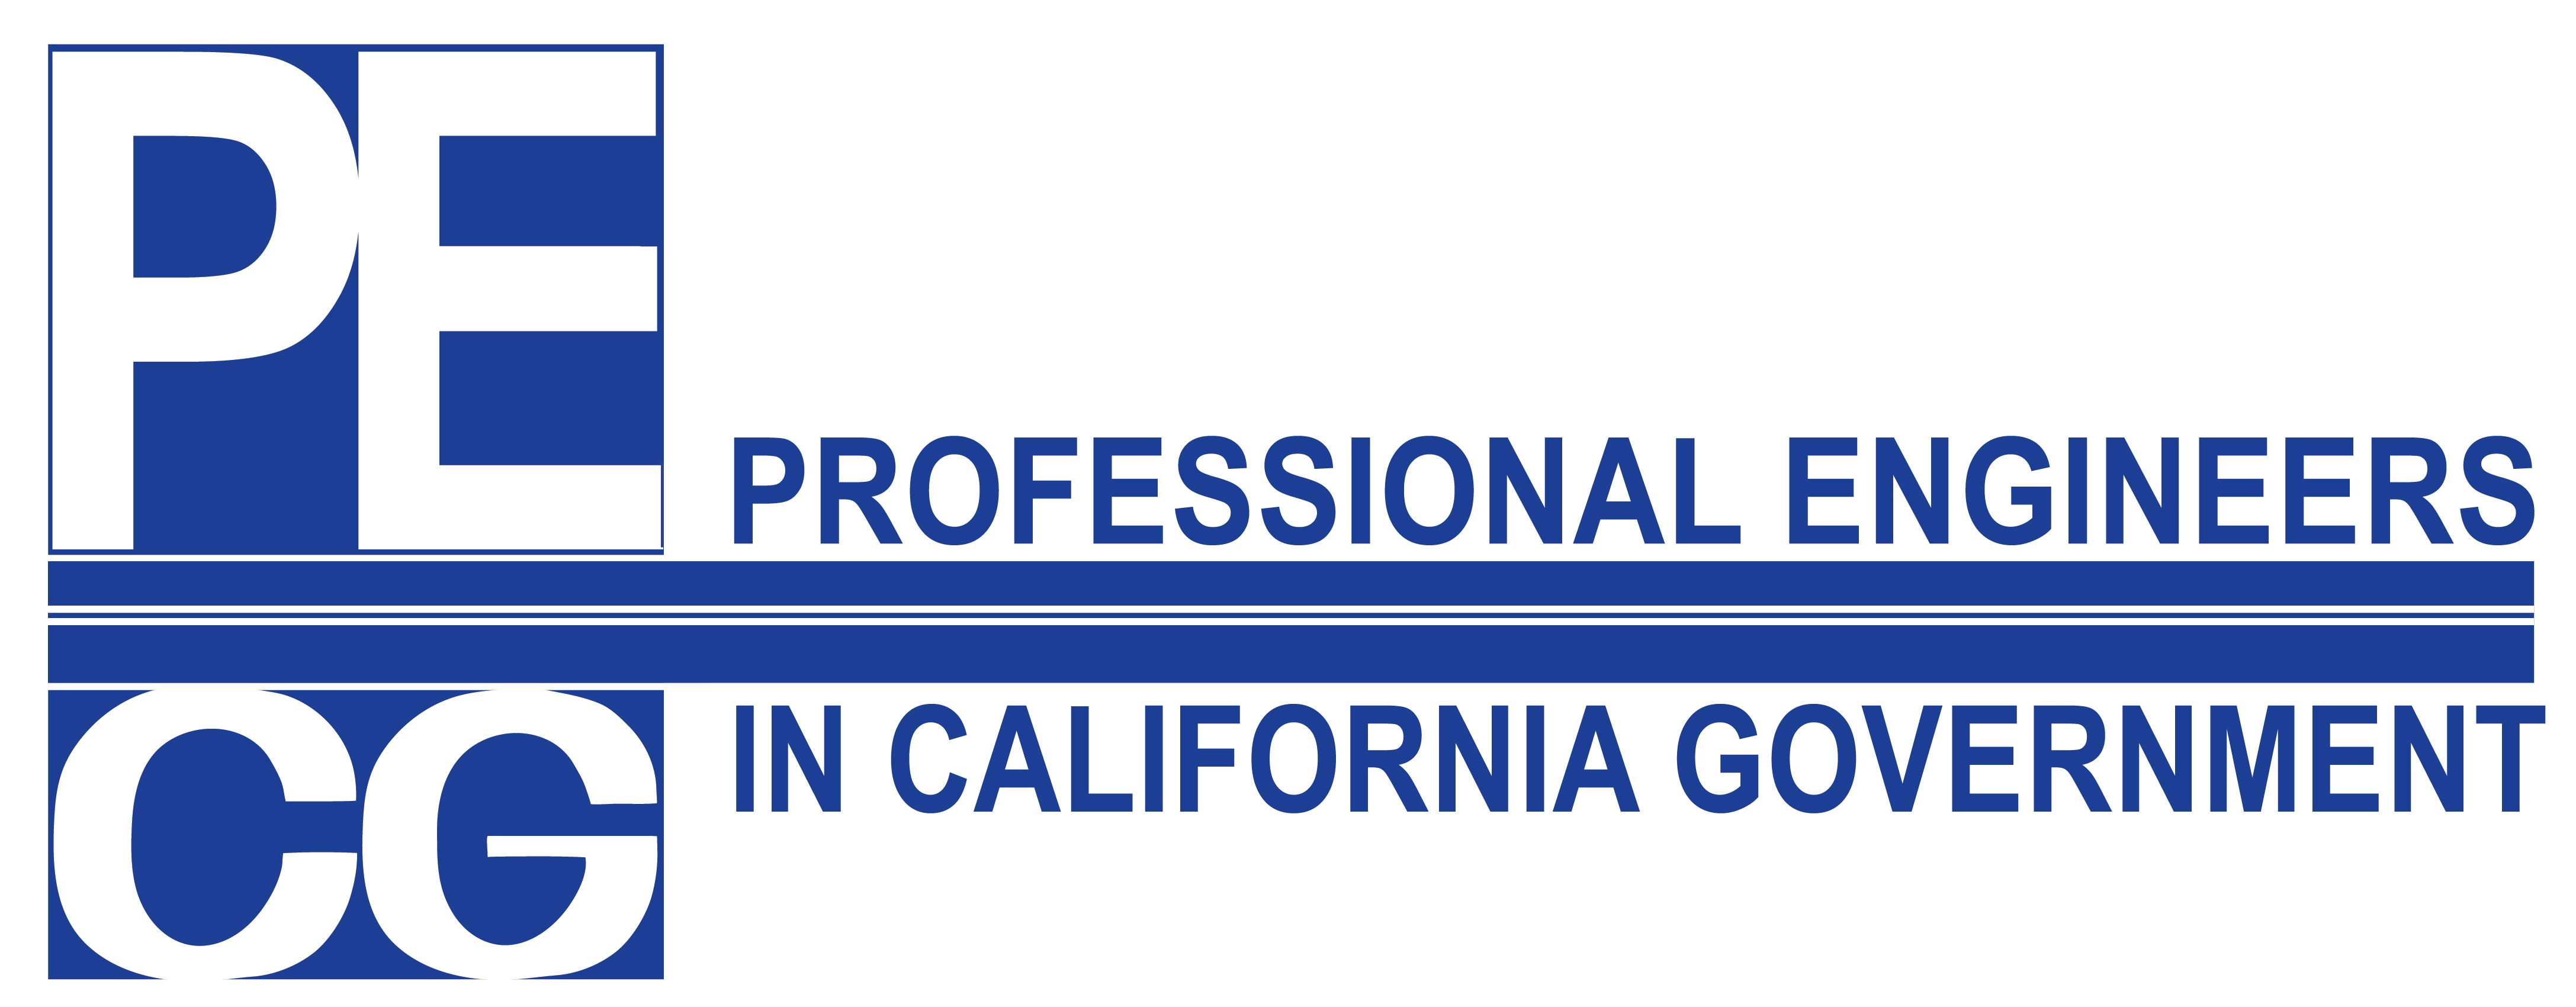 John and Marcia Goldman Foundation